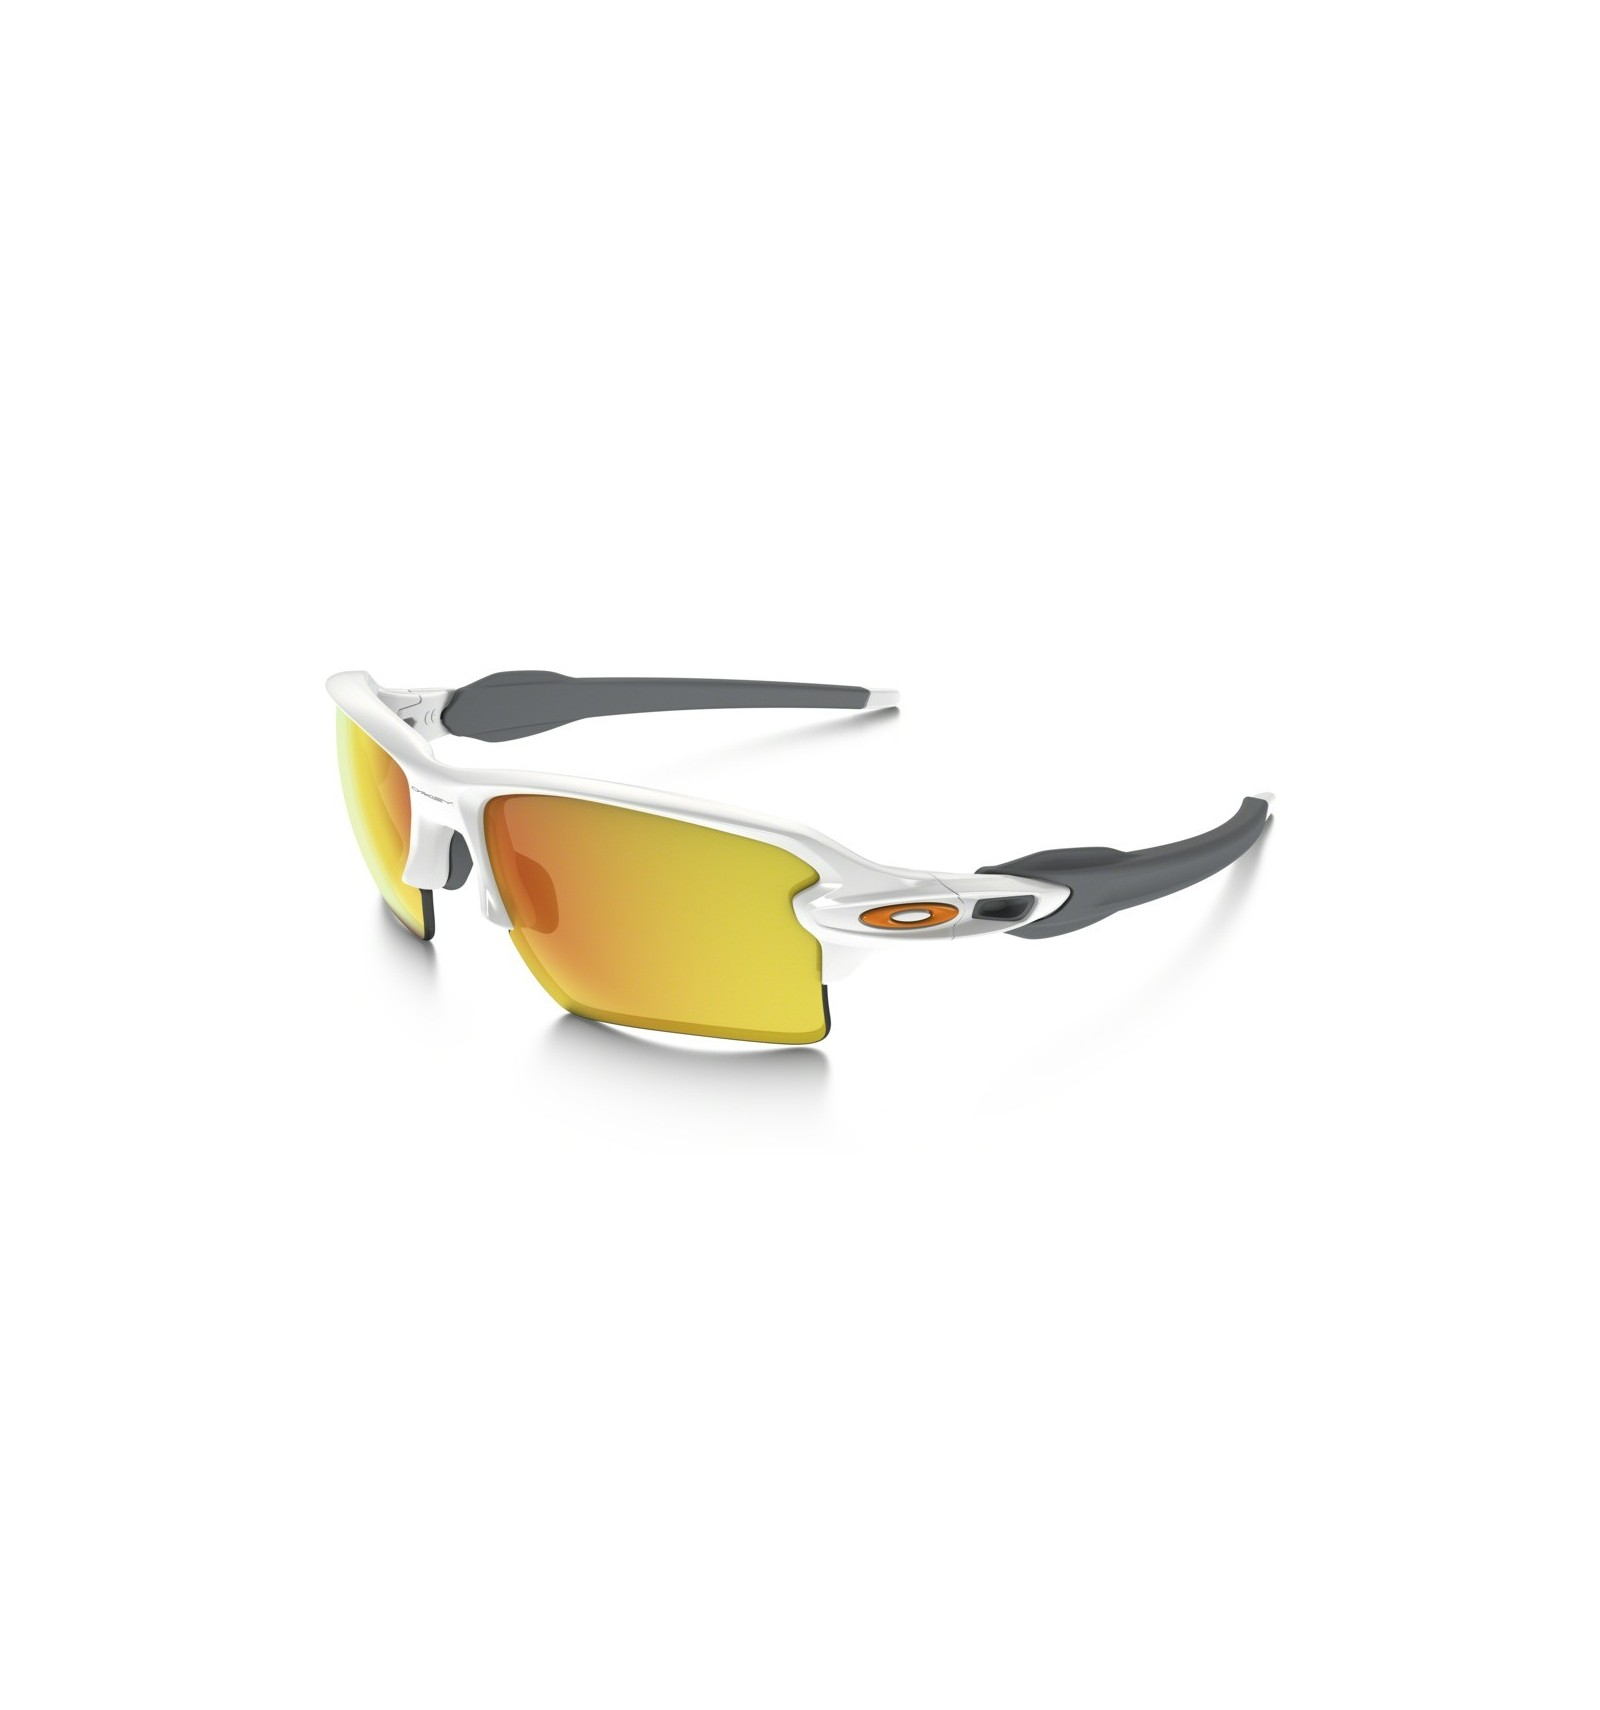 48c2c0018c Gafas de sol OAKLEY 9188 FLAK 2.0 XL Polished White / Fire Iridium